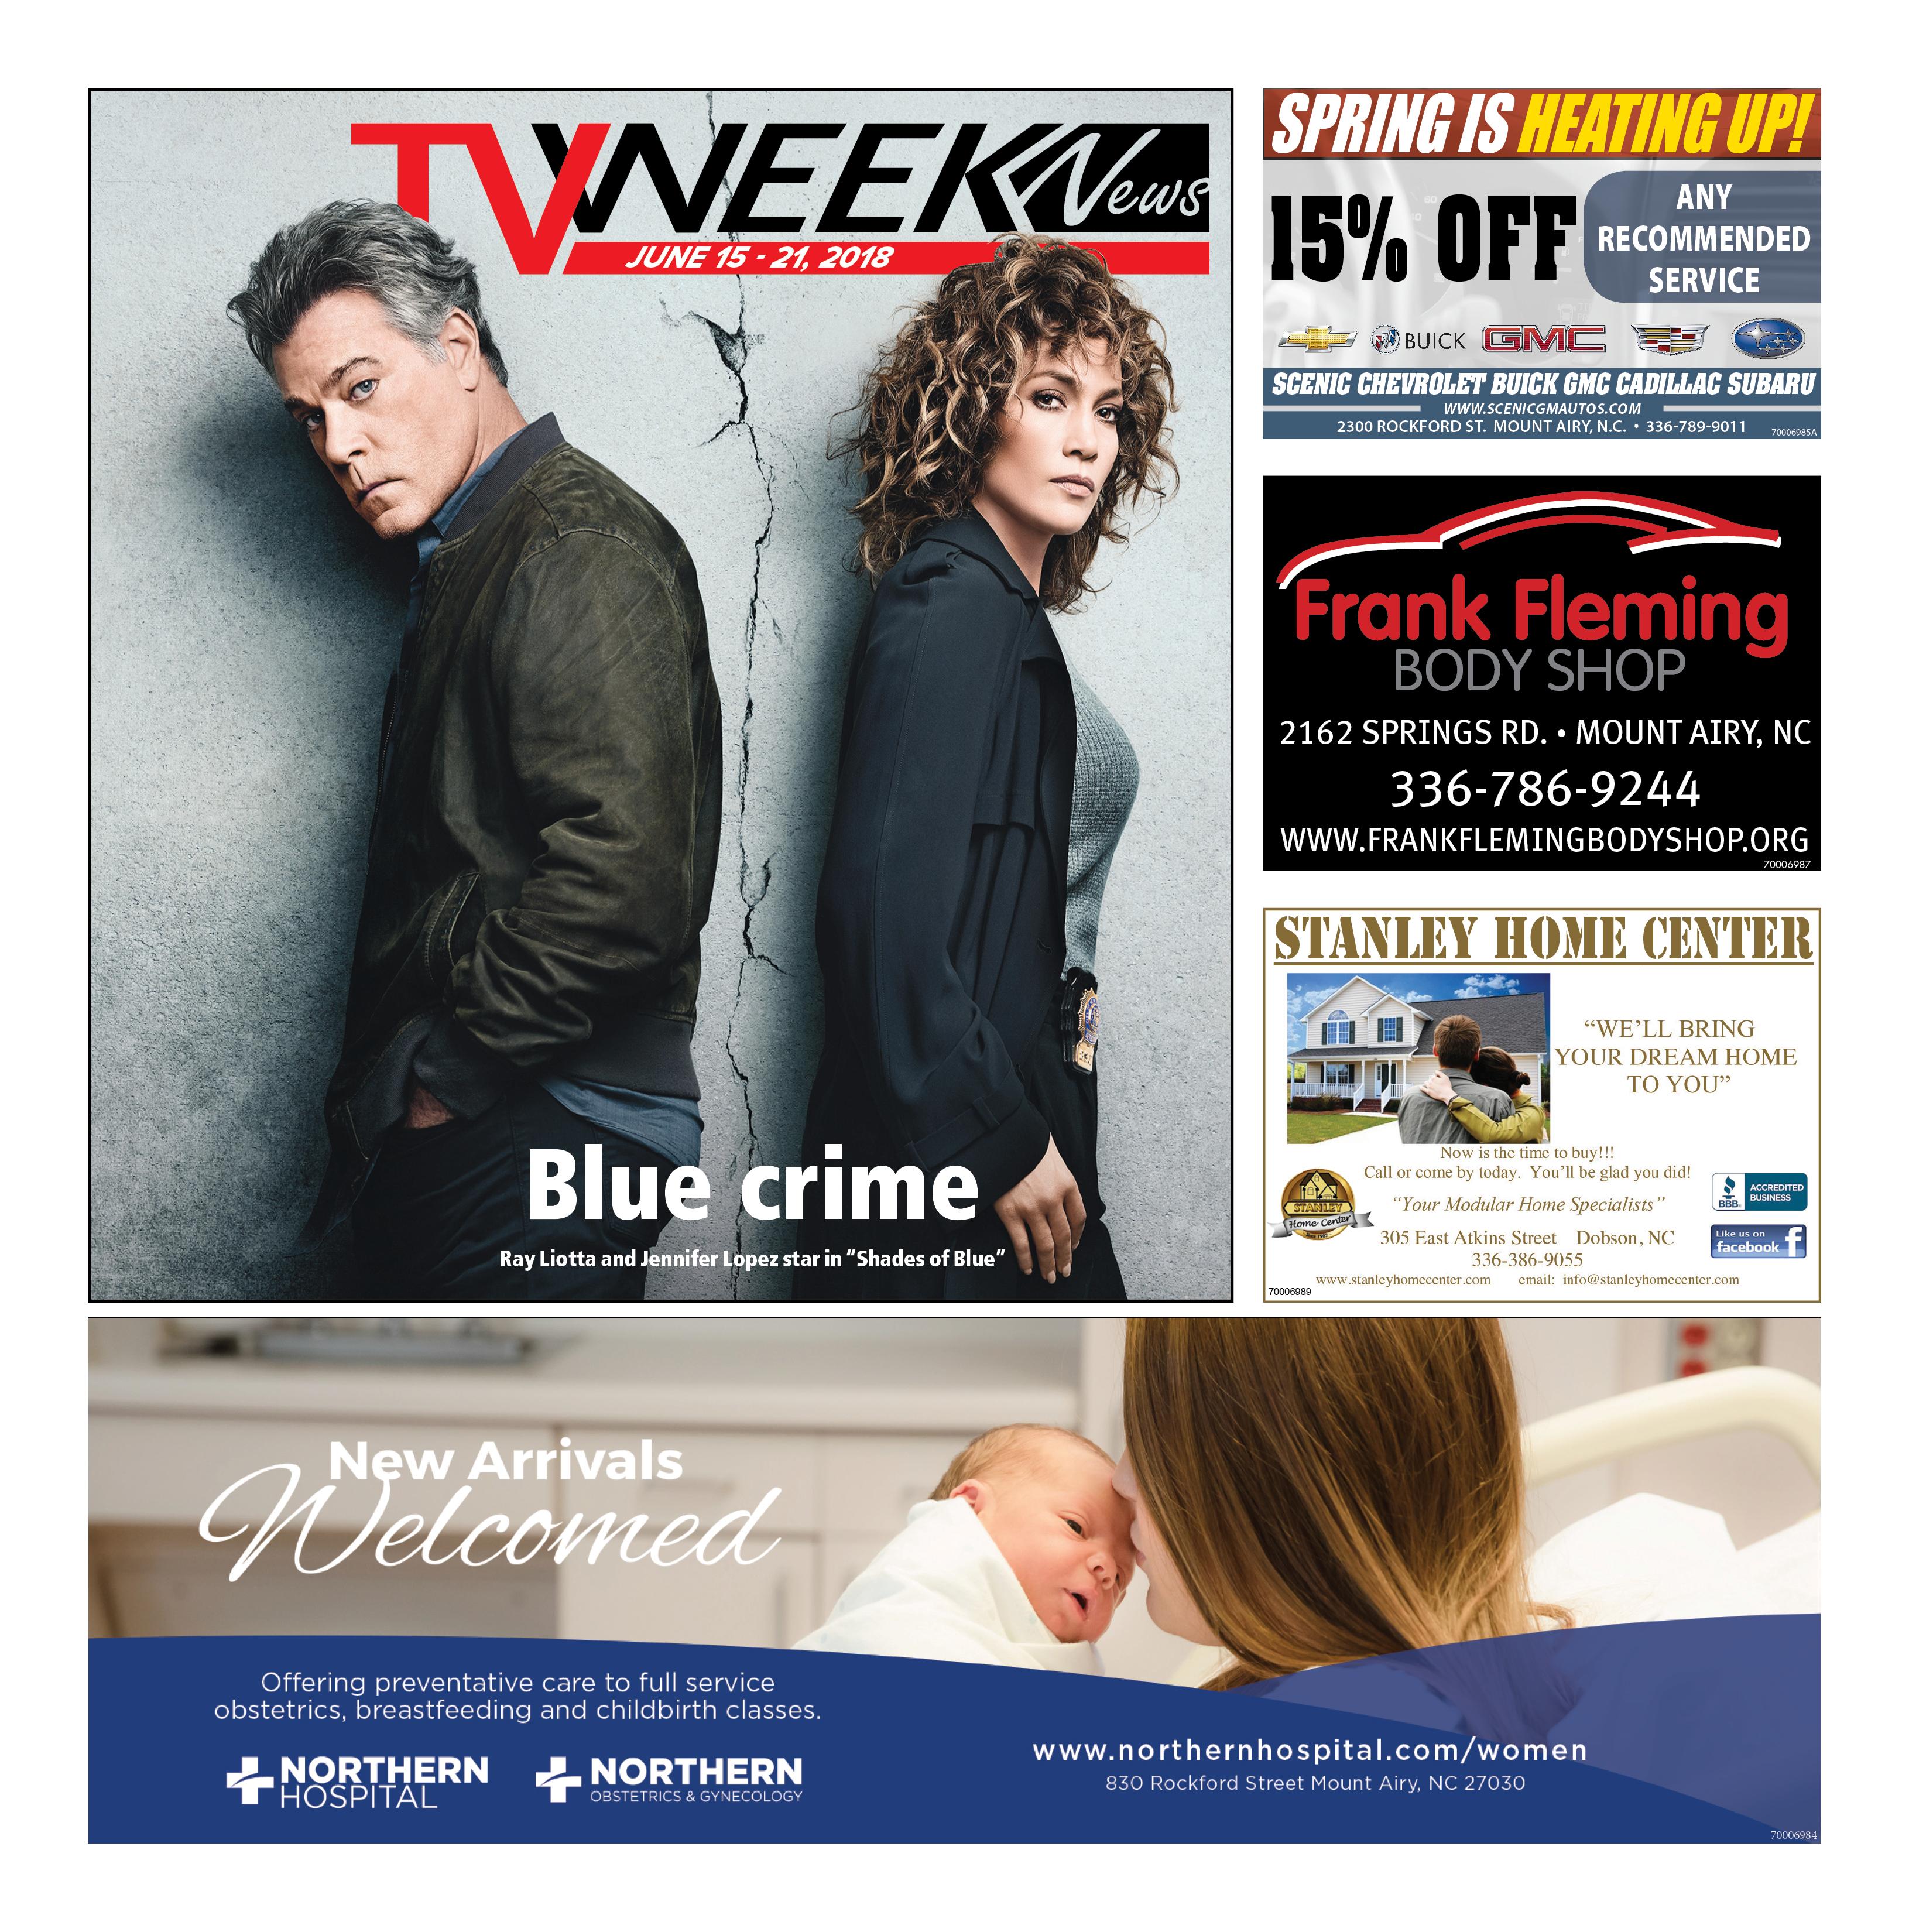 TV WEEK News June 15 – 21, 2018